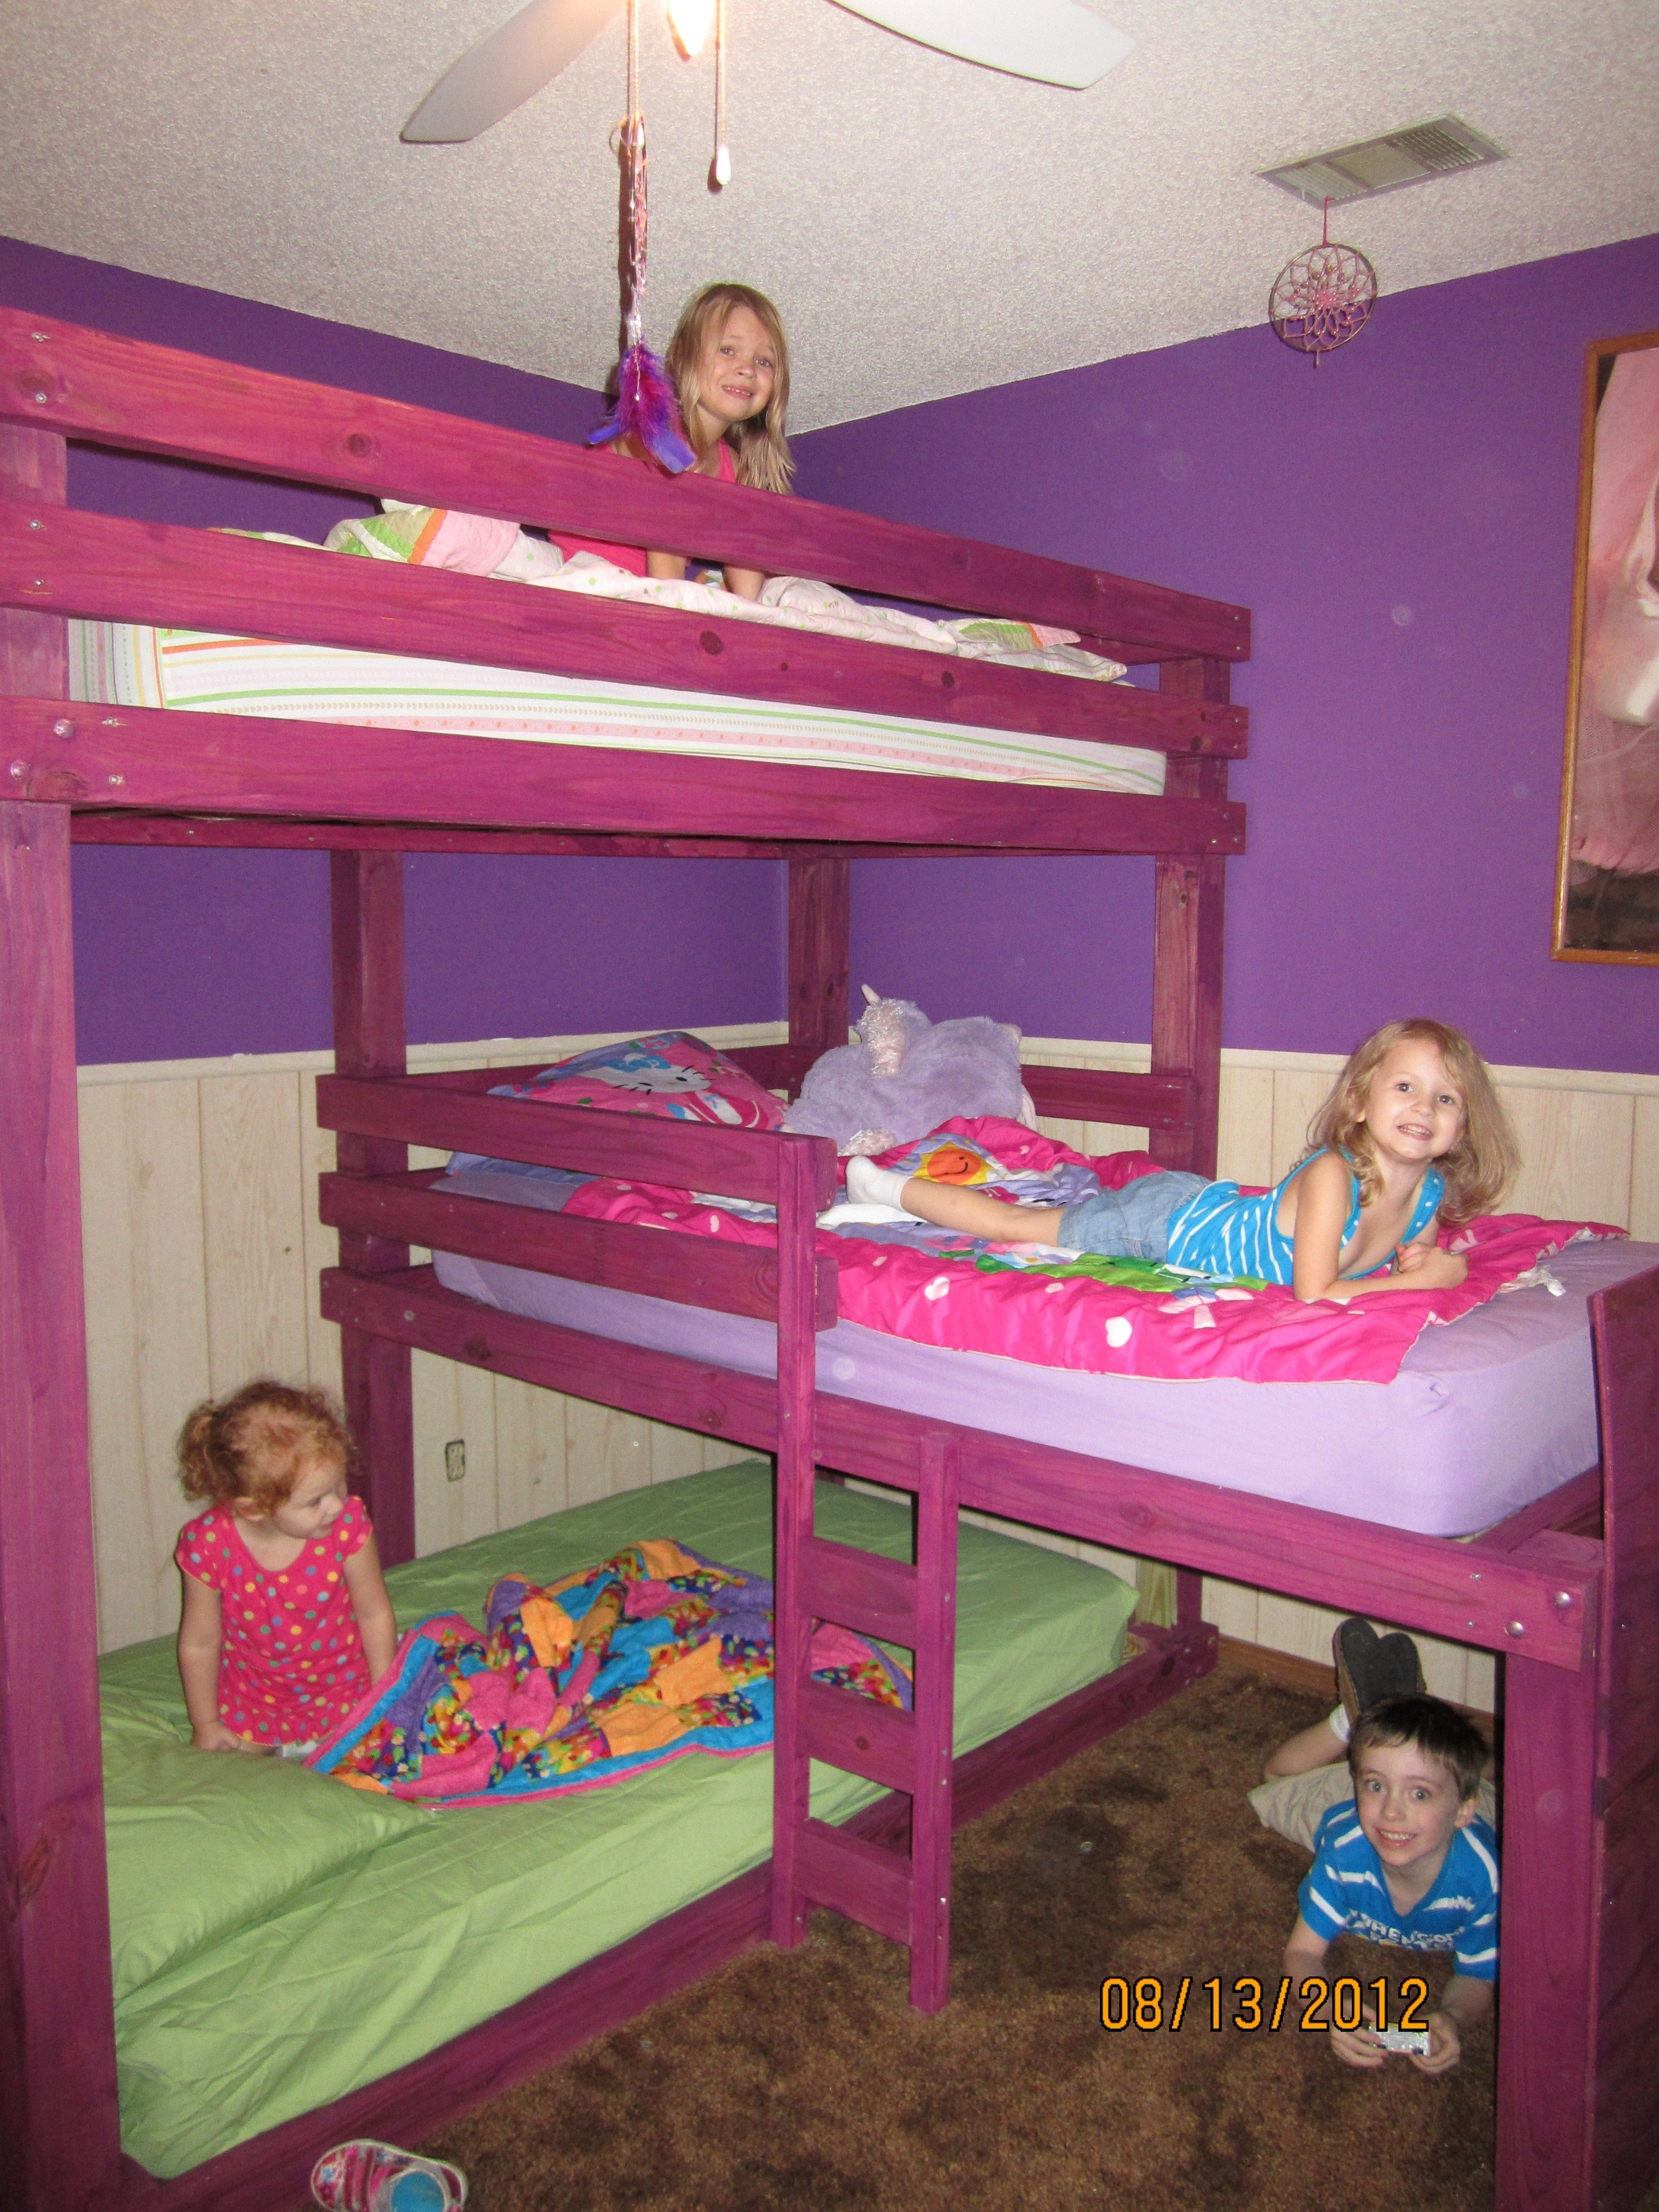 Triple Bunk Beds We Built This Weekend